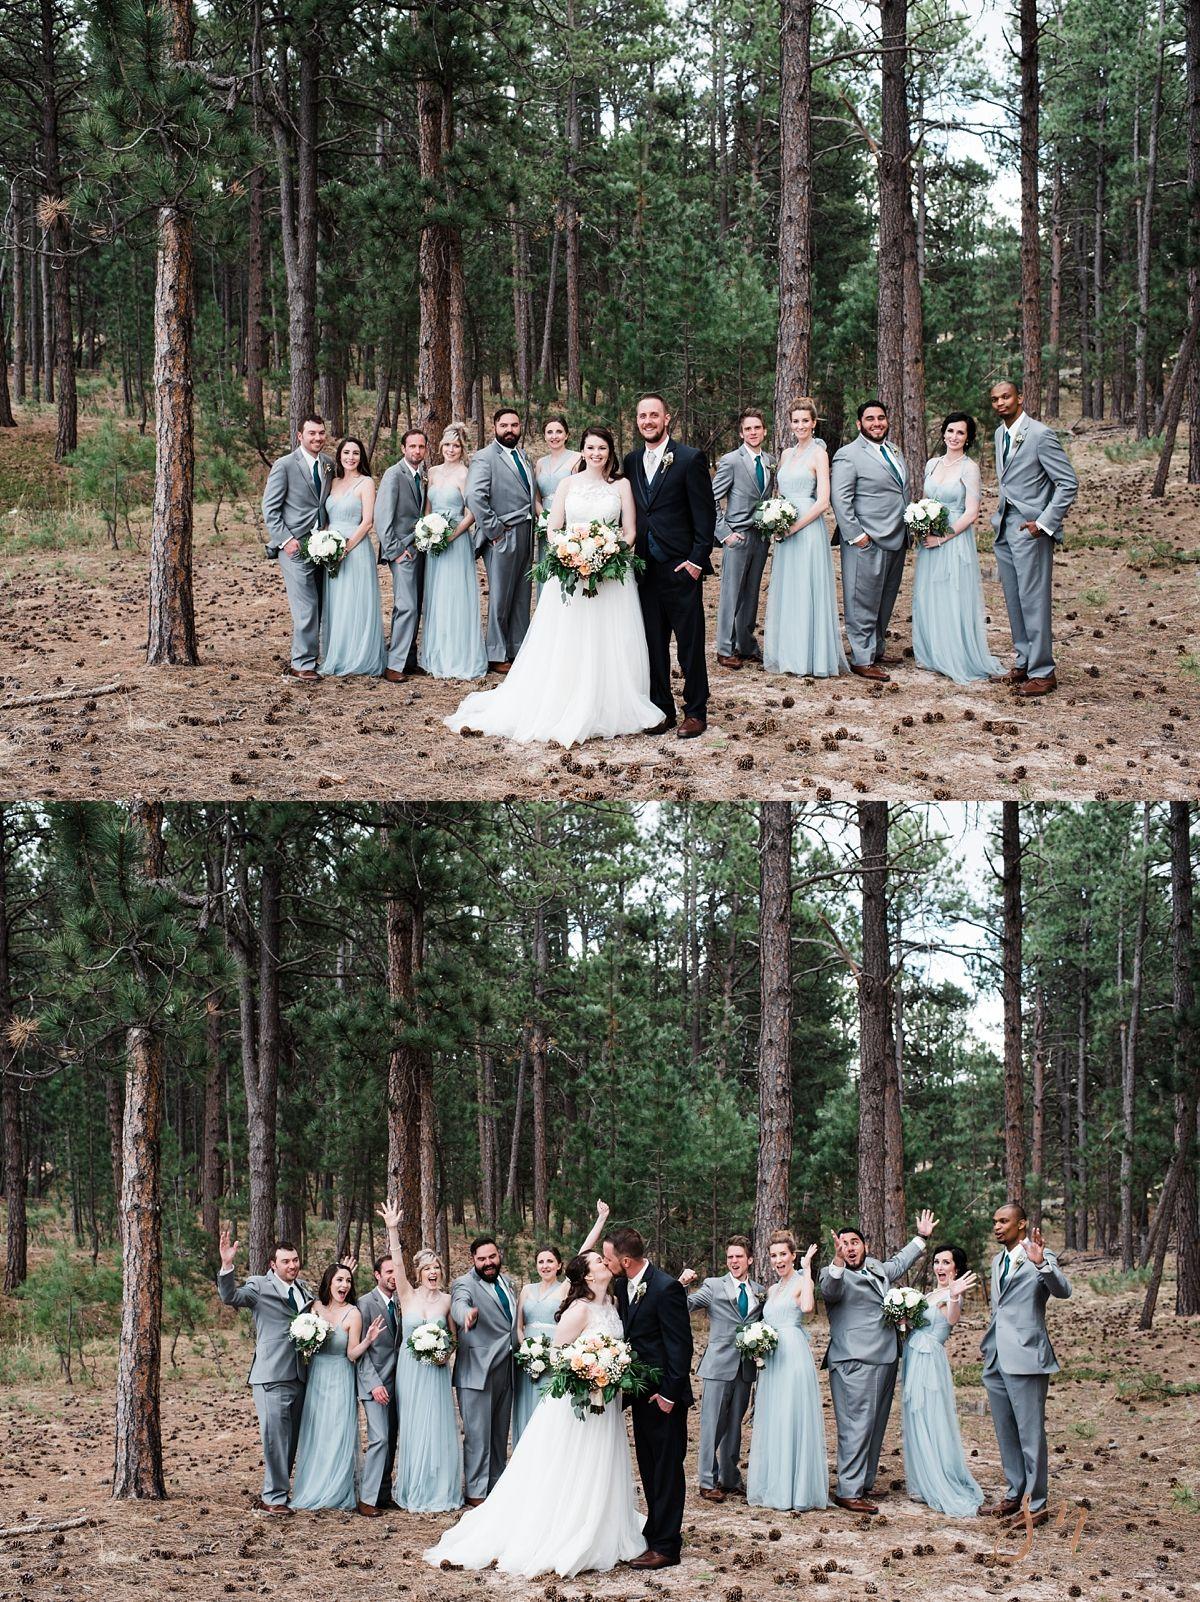 Wedgewood Weddings | Black Forest | Colorado Wedding Venue ...